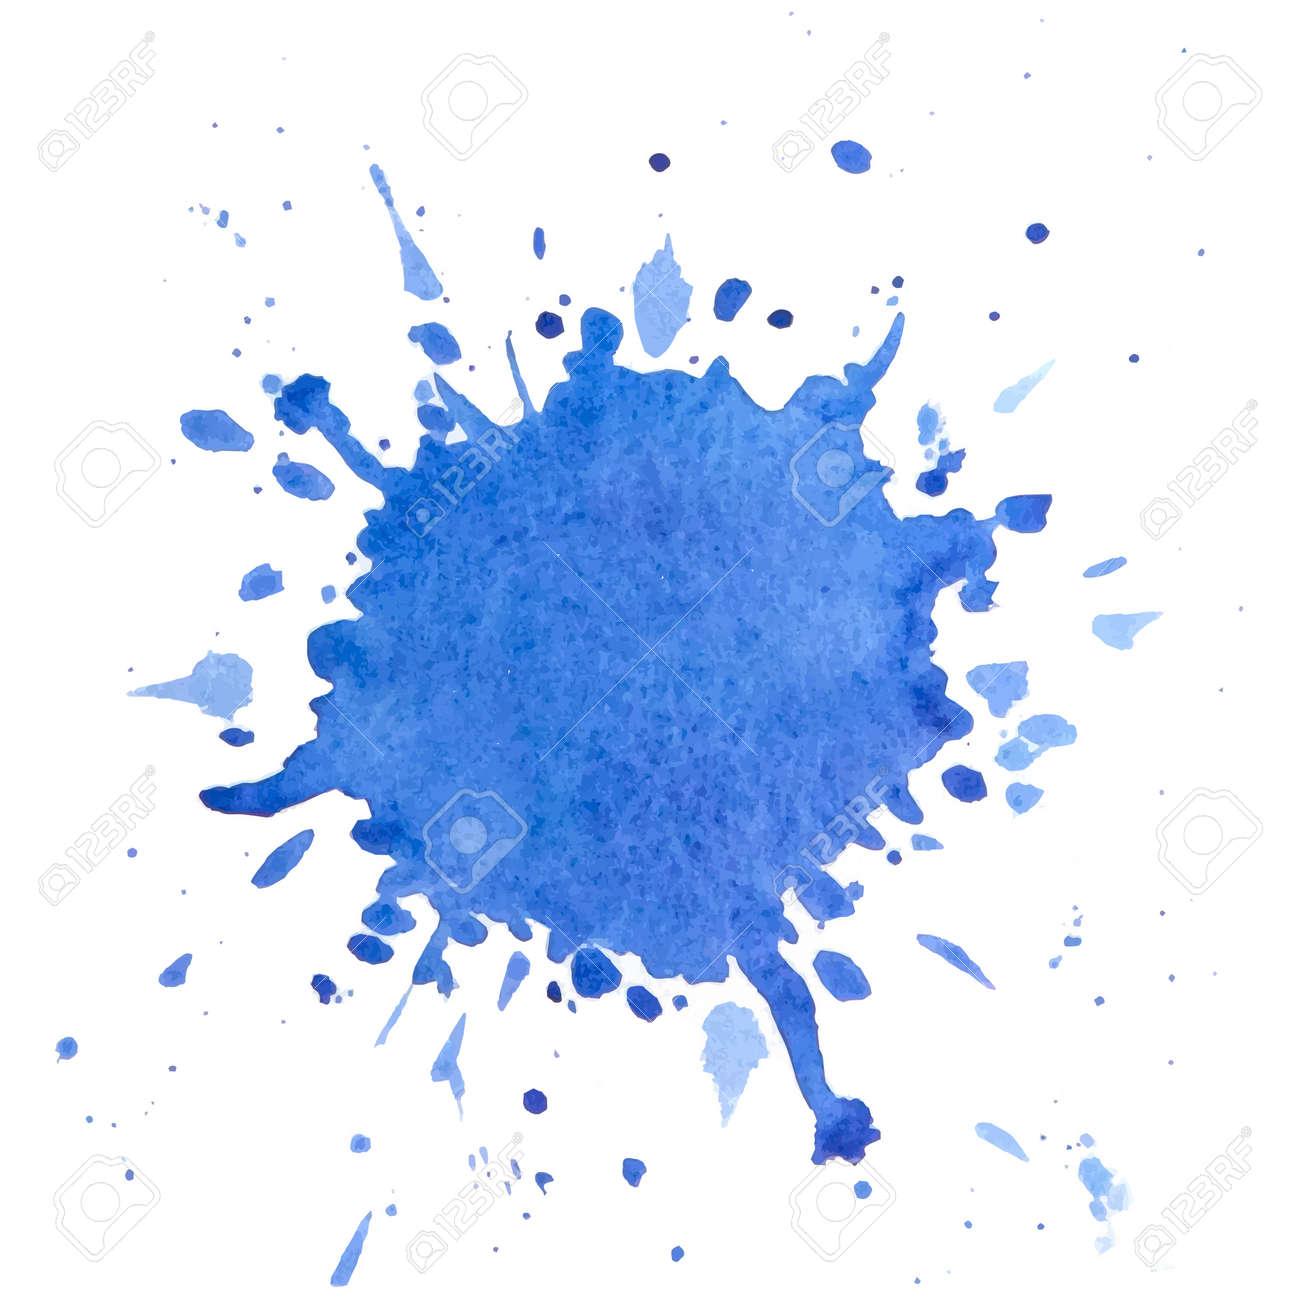 paint splash vector watercolor design element royalty free rh 123rf com paint splash vector download paint splash vector cdr